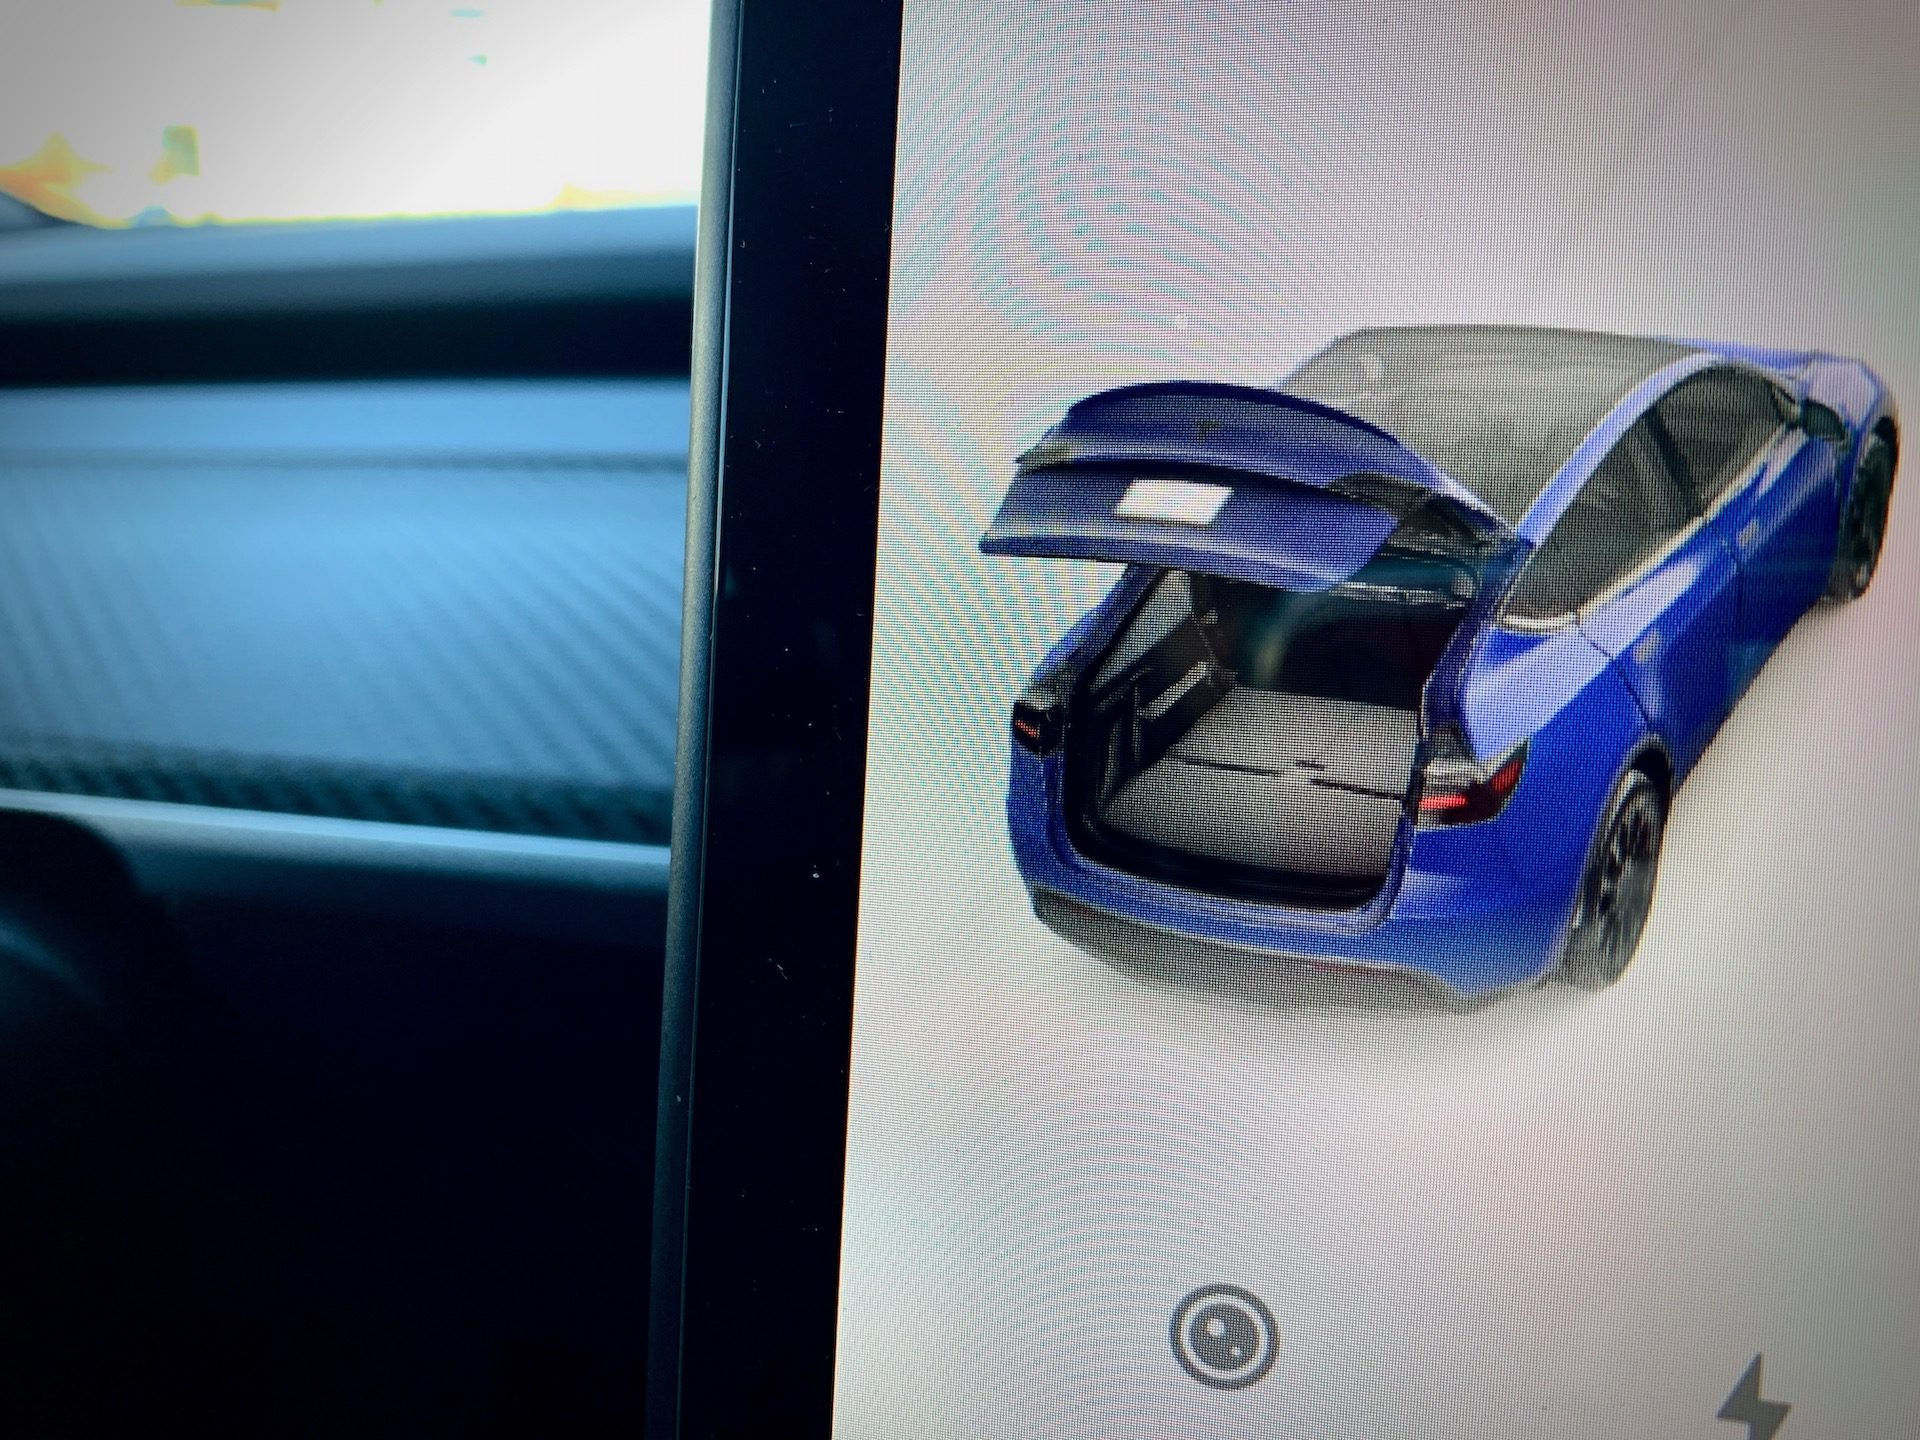 Tesla Model Y 7-Seat Folded 3rd Row Rear Seats (Photo: Teslarati)